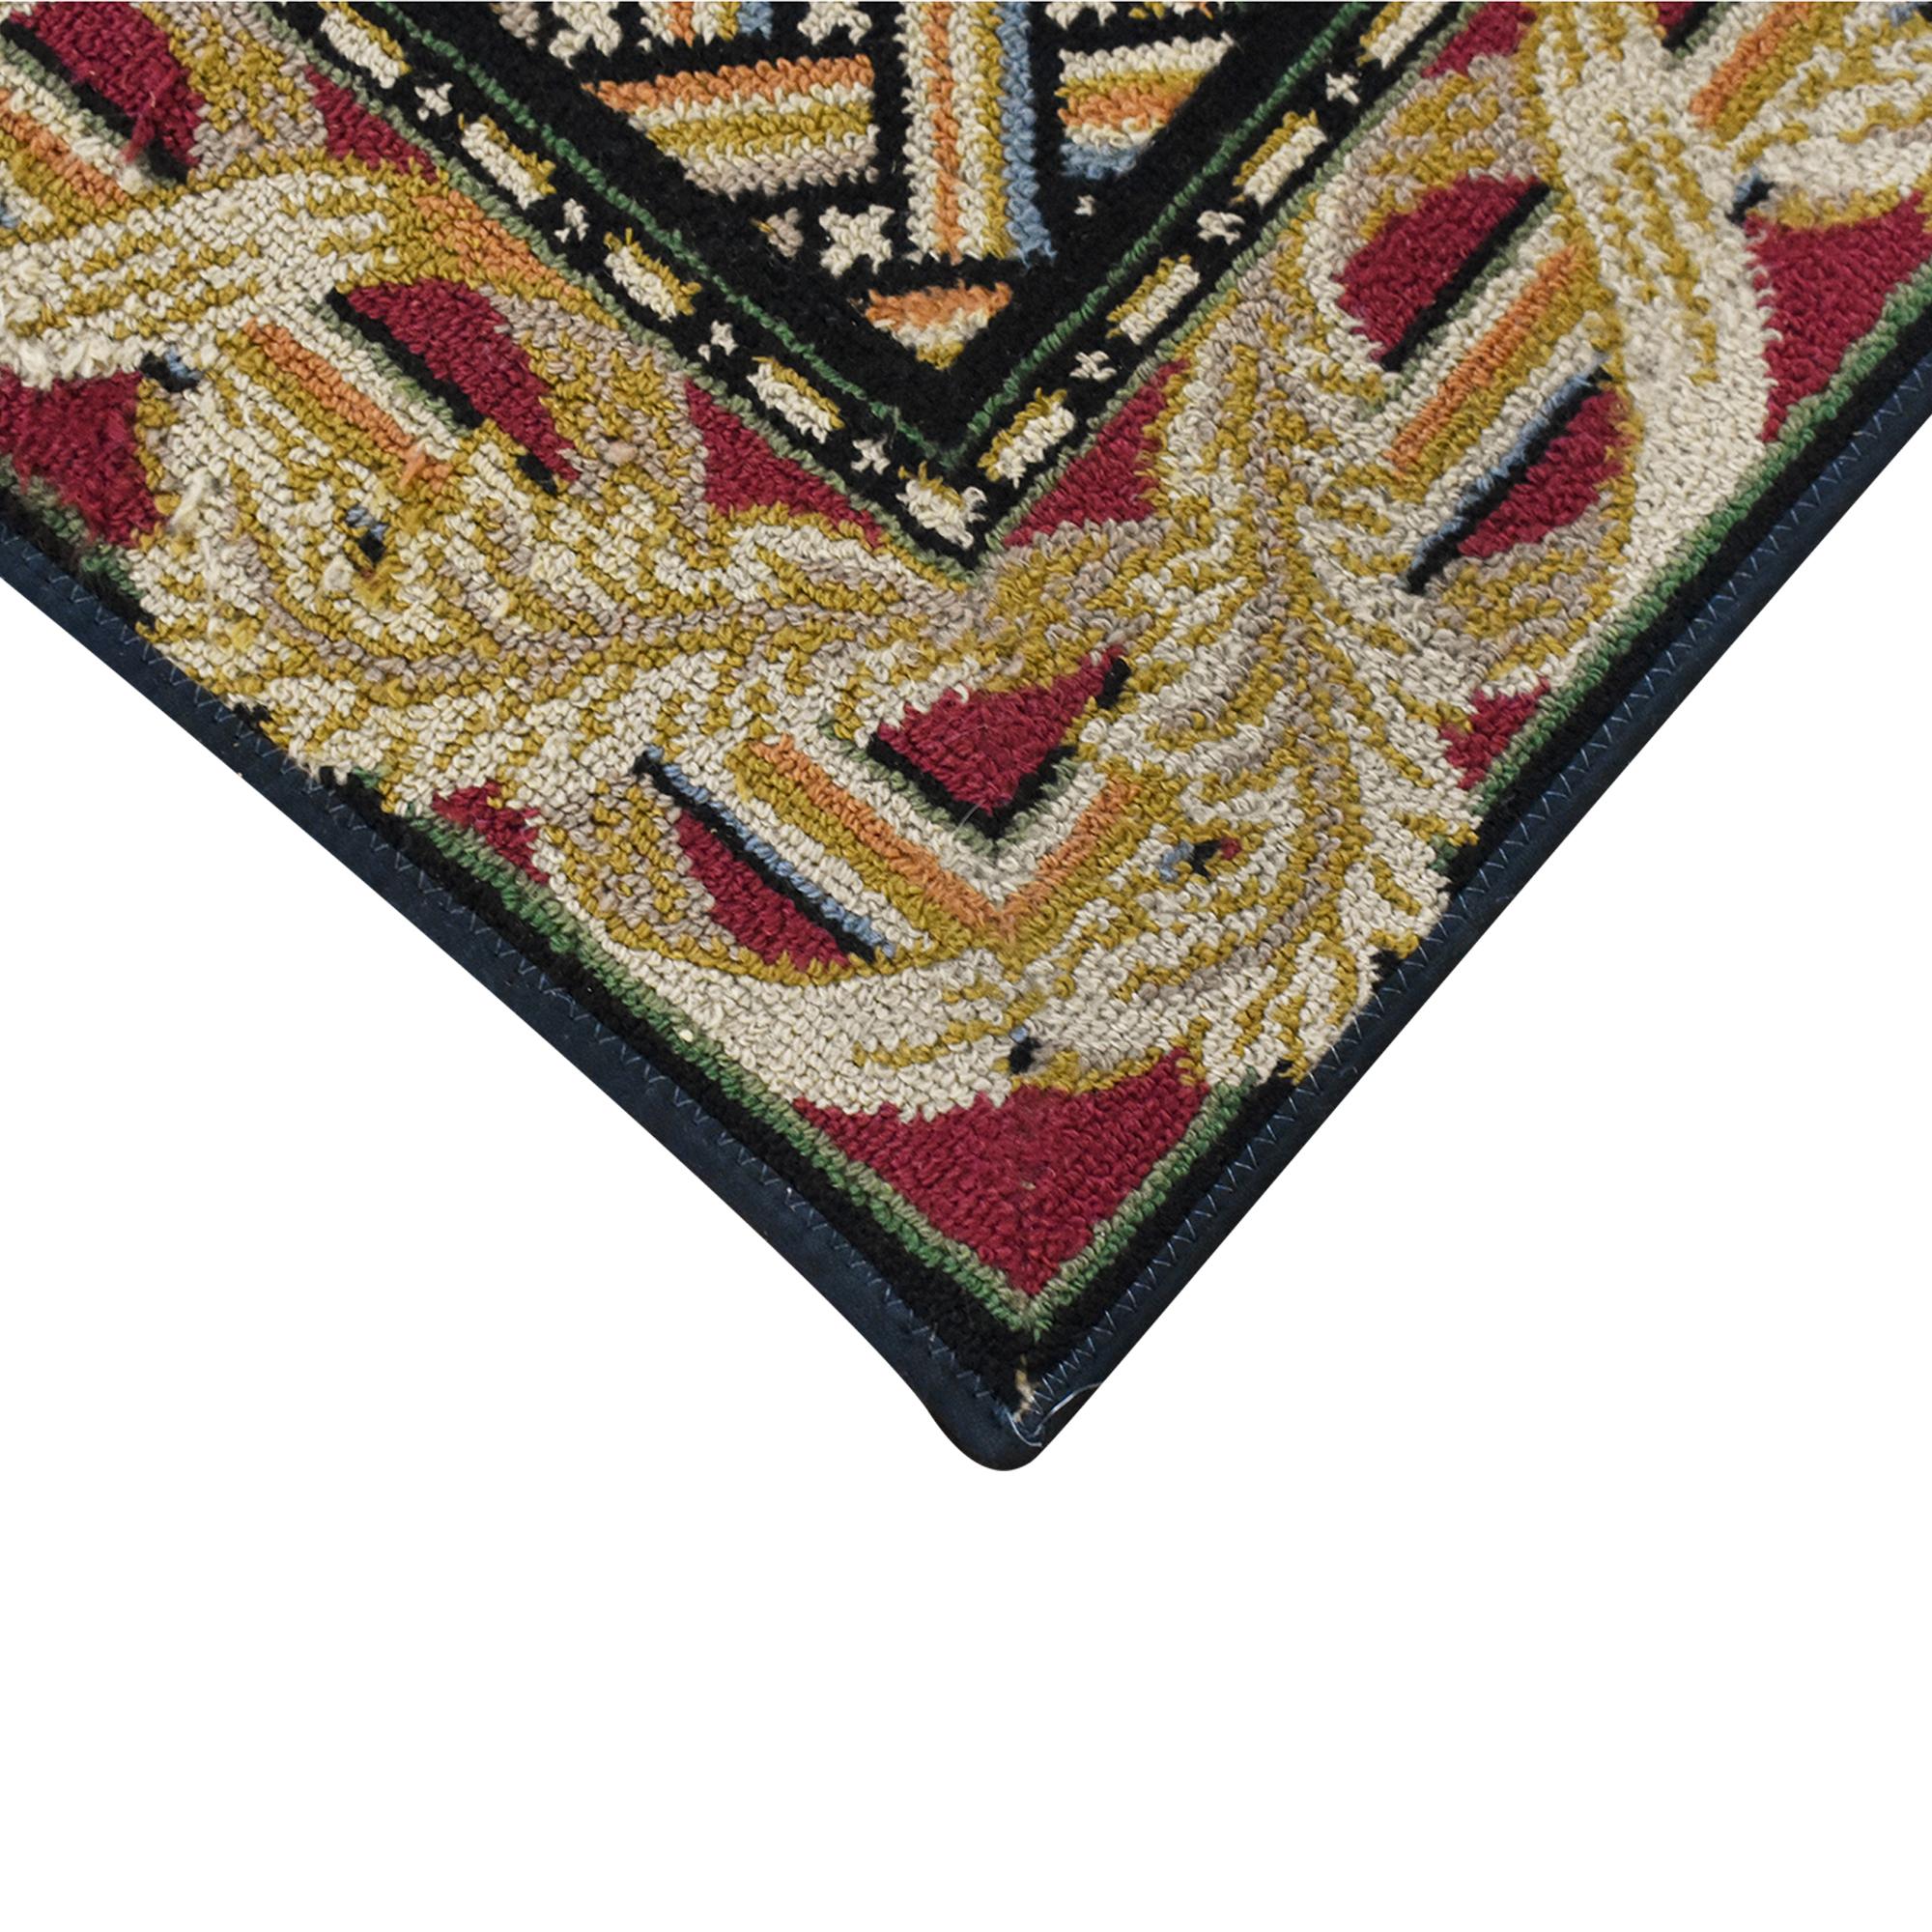 Stark Carpet Stark Carpet Geometric Area Rug coupon